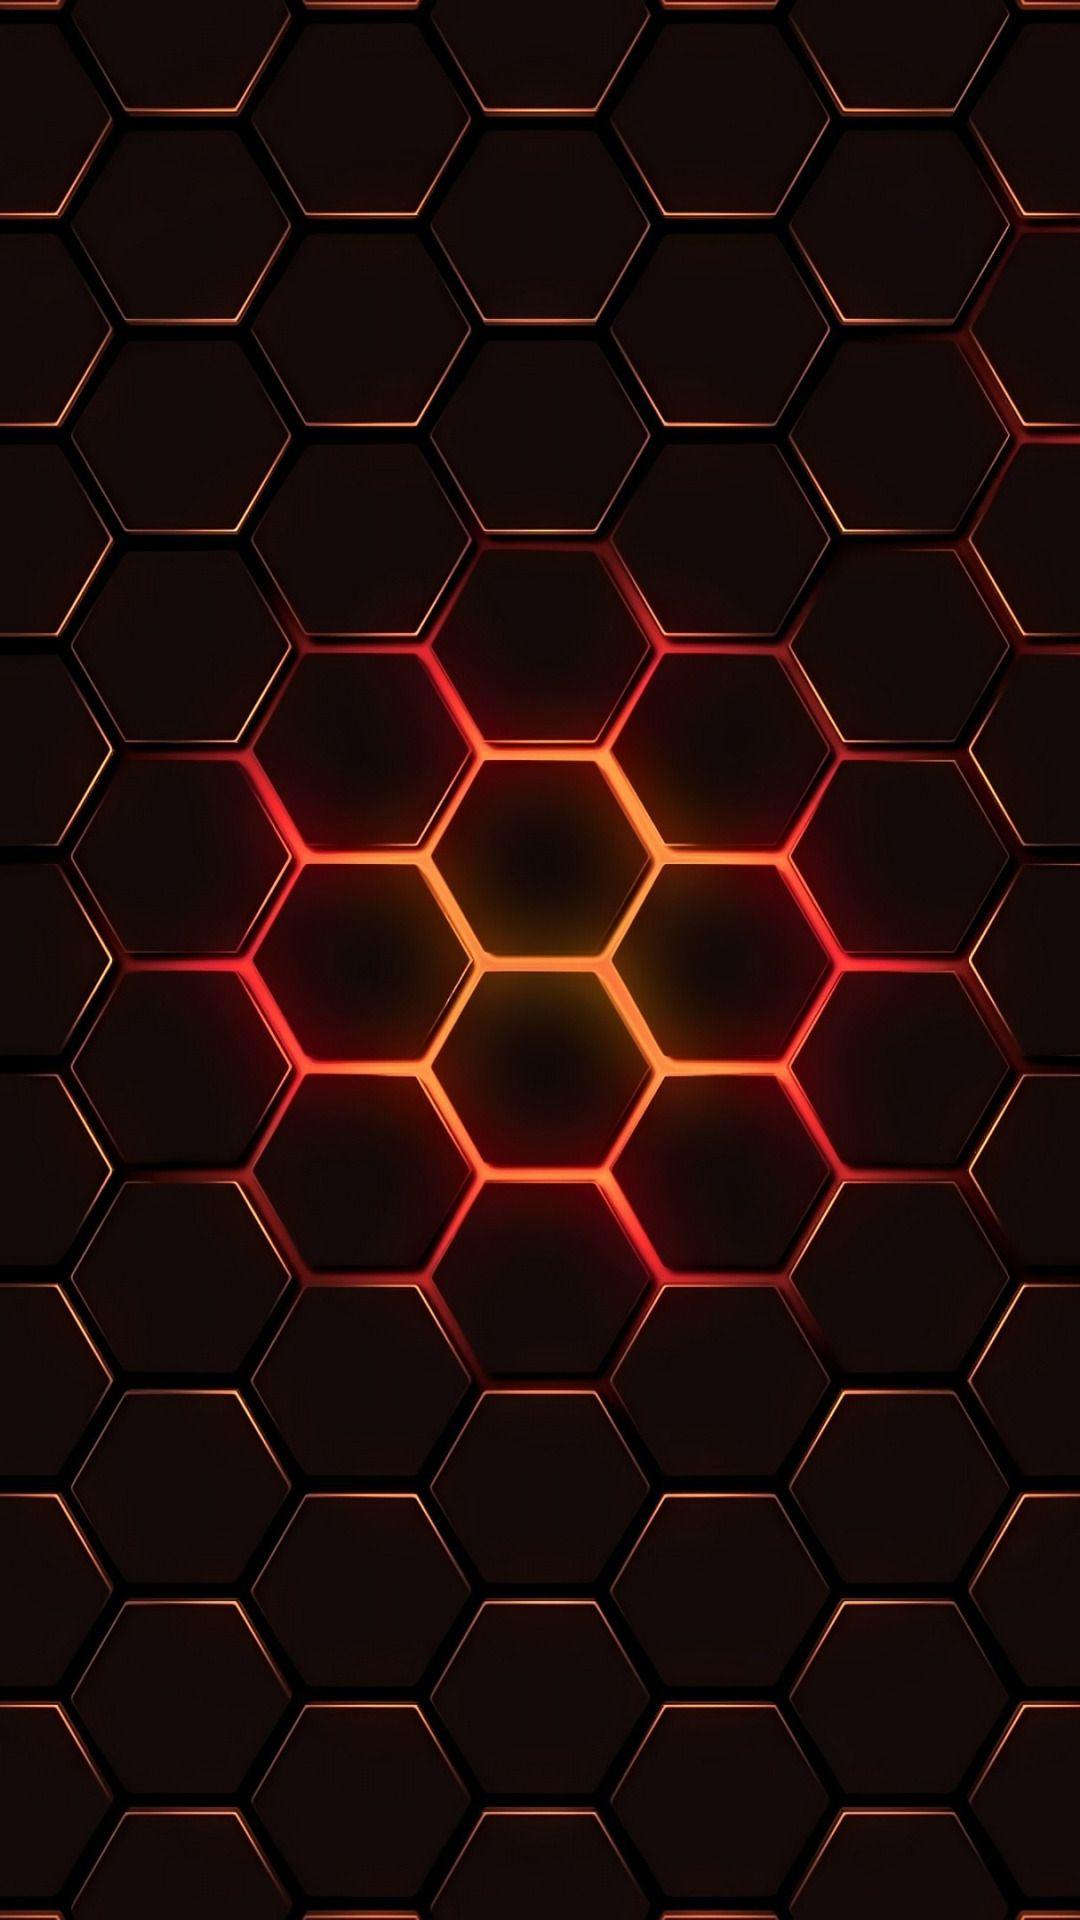 hexagon abstract geometry wallpaper